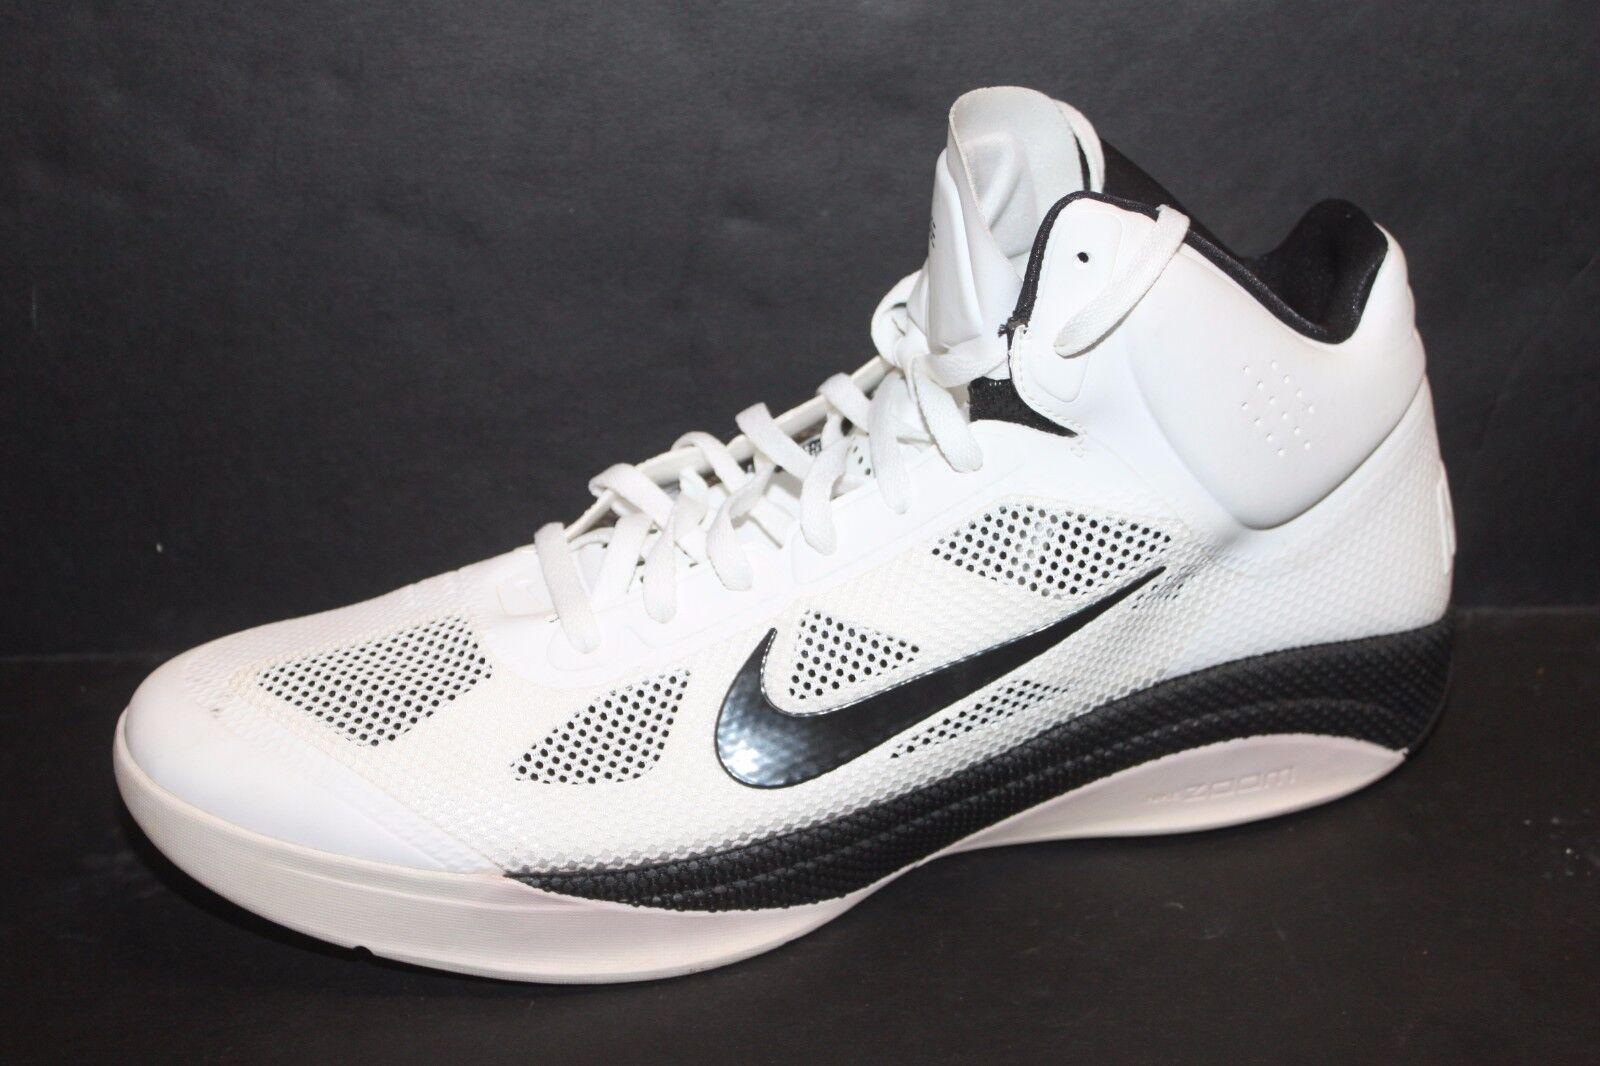 separation shoes 61d53 13e08 Nike Hyperfuse 2018 blanco   negro negro negro 407623-100 reducción del  precio barato hombres